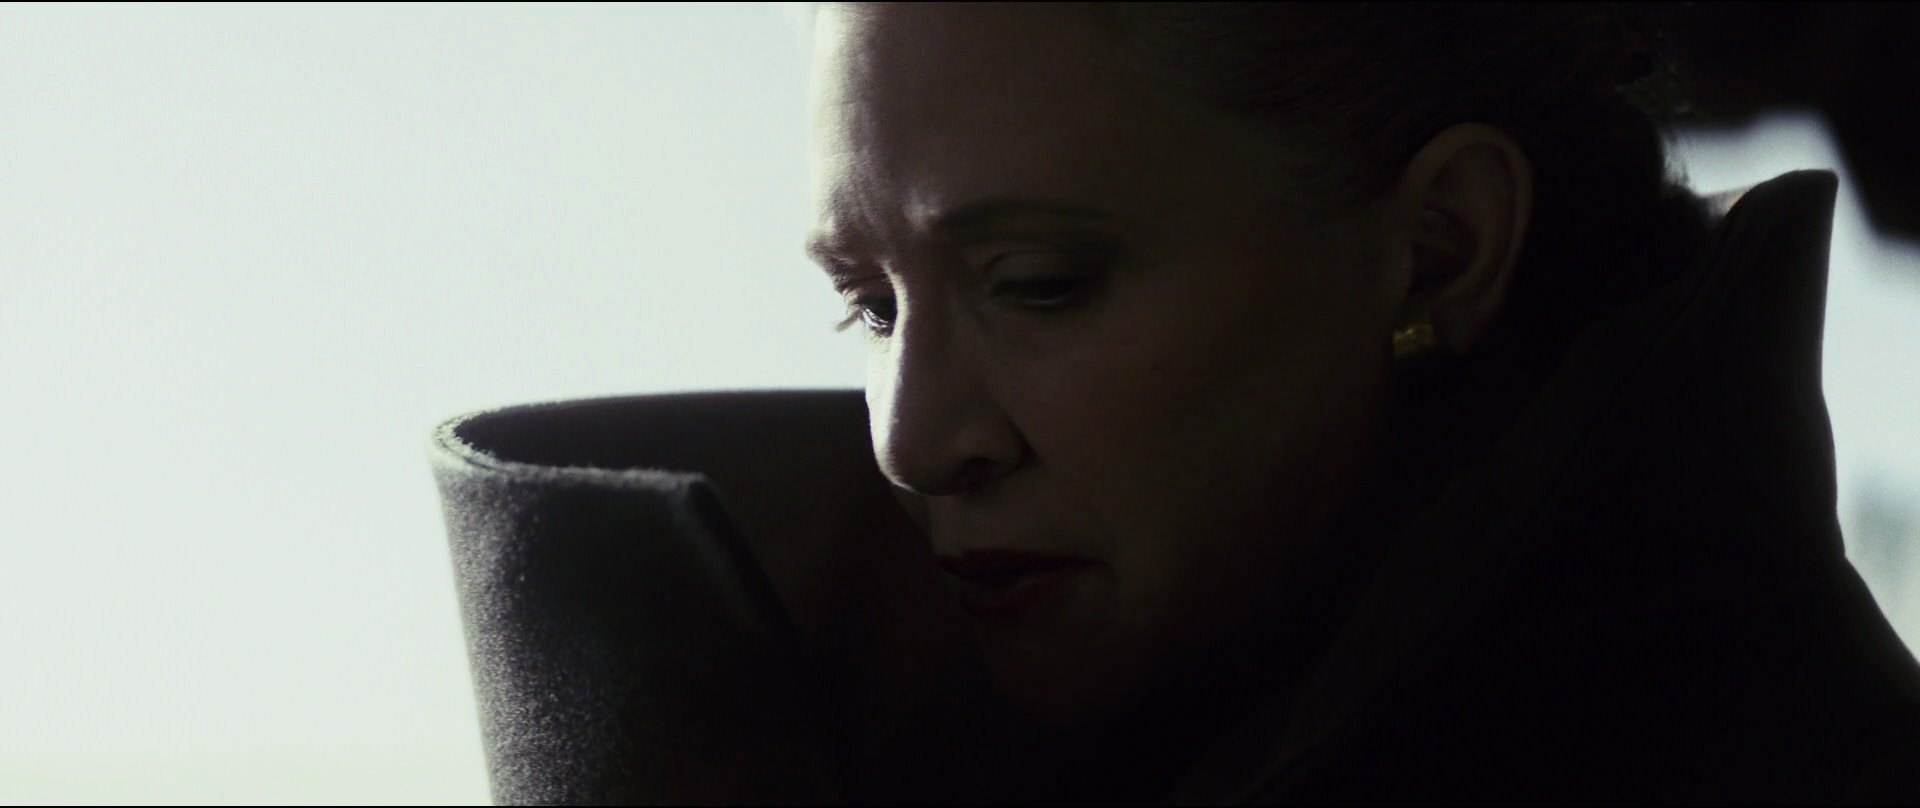 starwars-lastjedi-movie-screencaps.com-13750.jpg